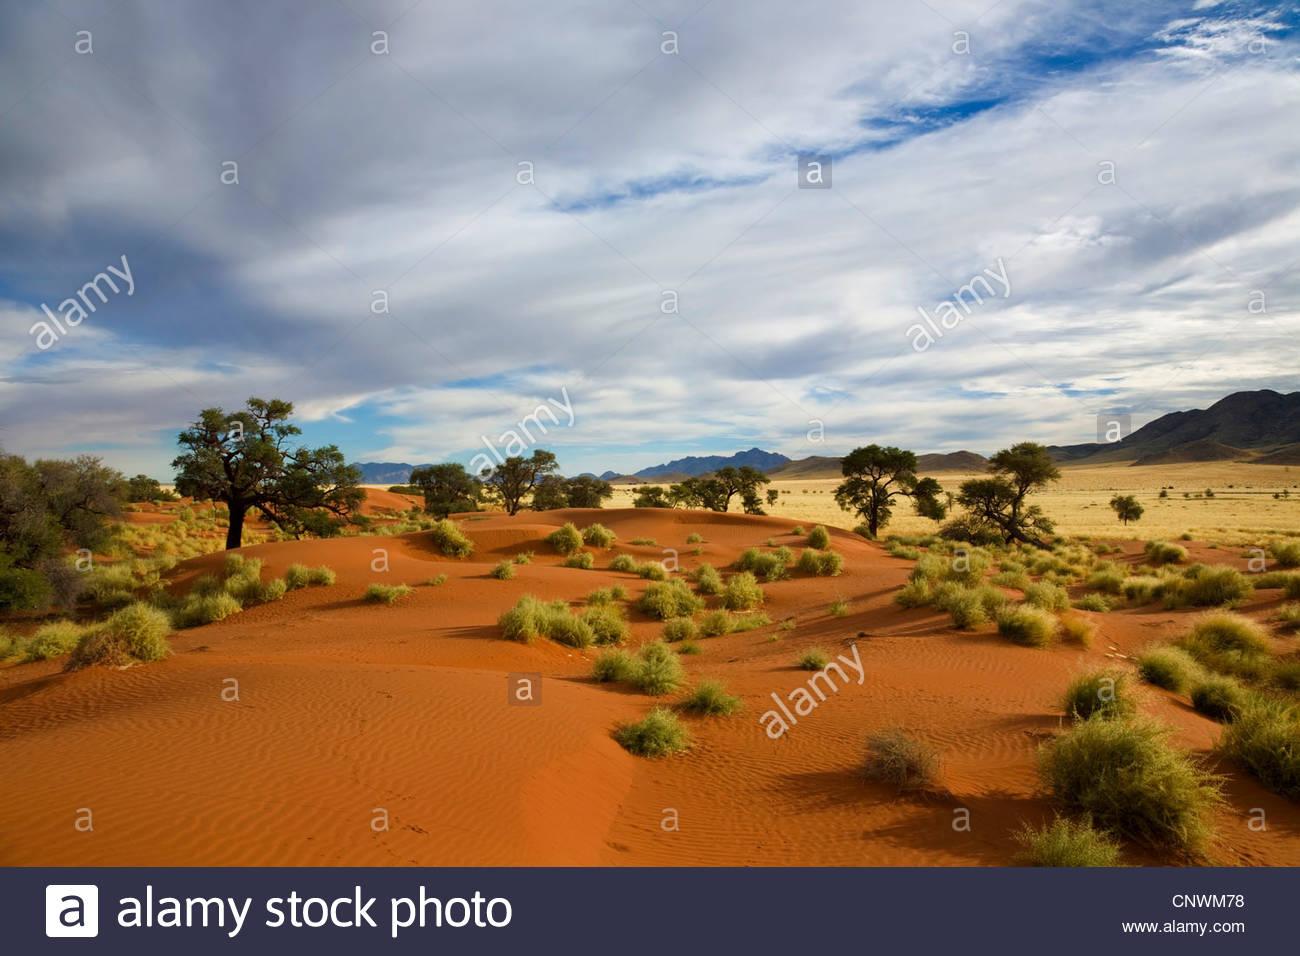 sand dune in morning light, Namibia, Namib Naukluft National Park - Stock Image